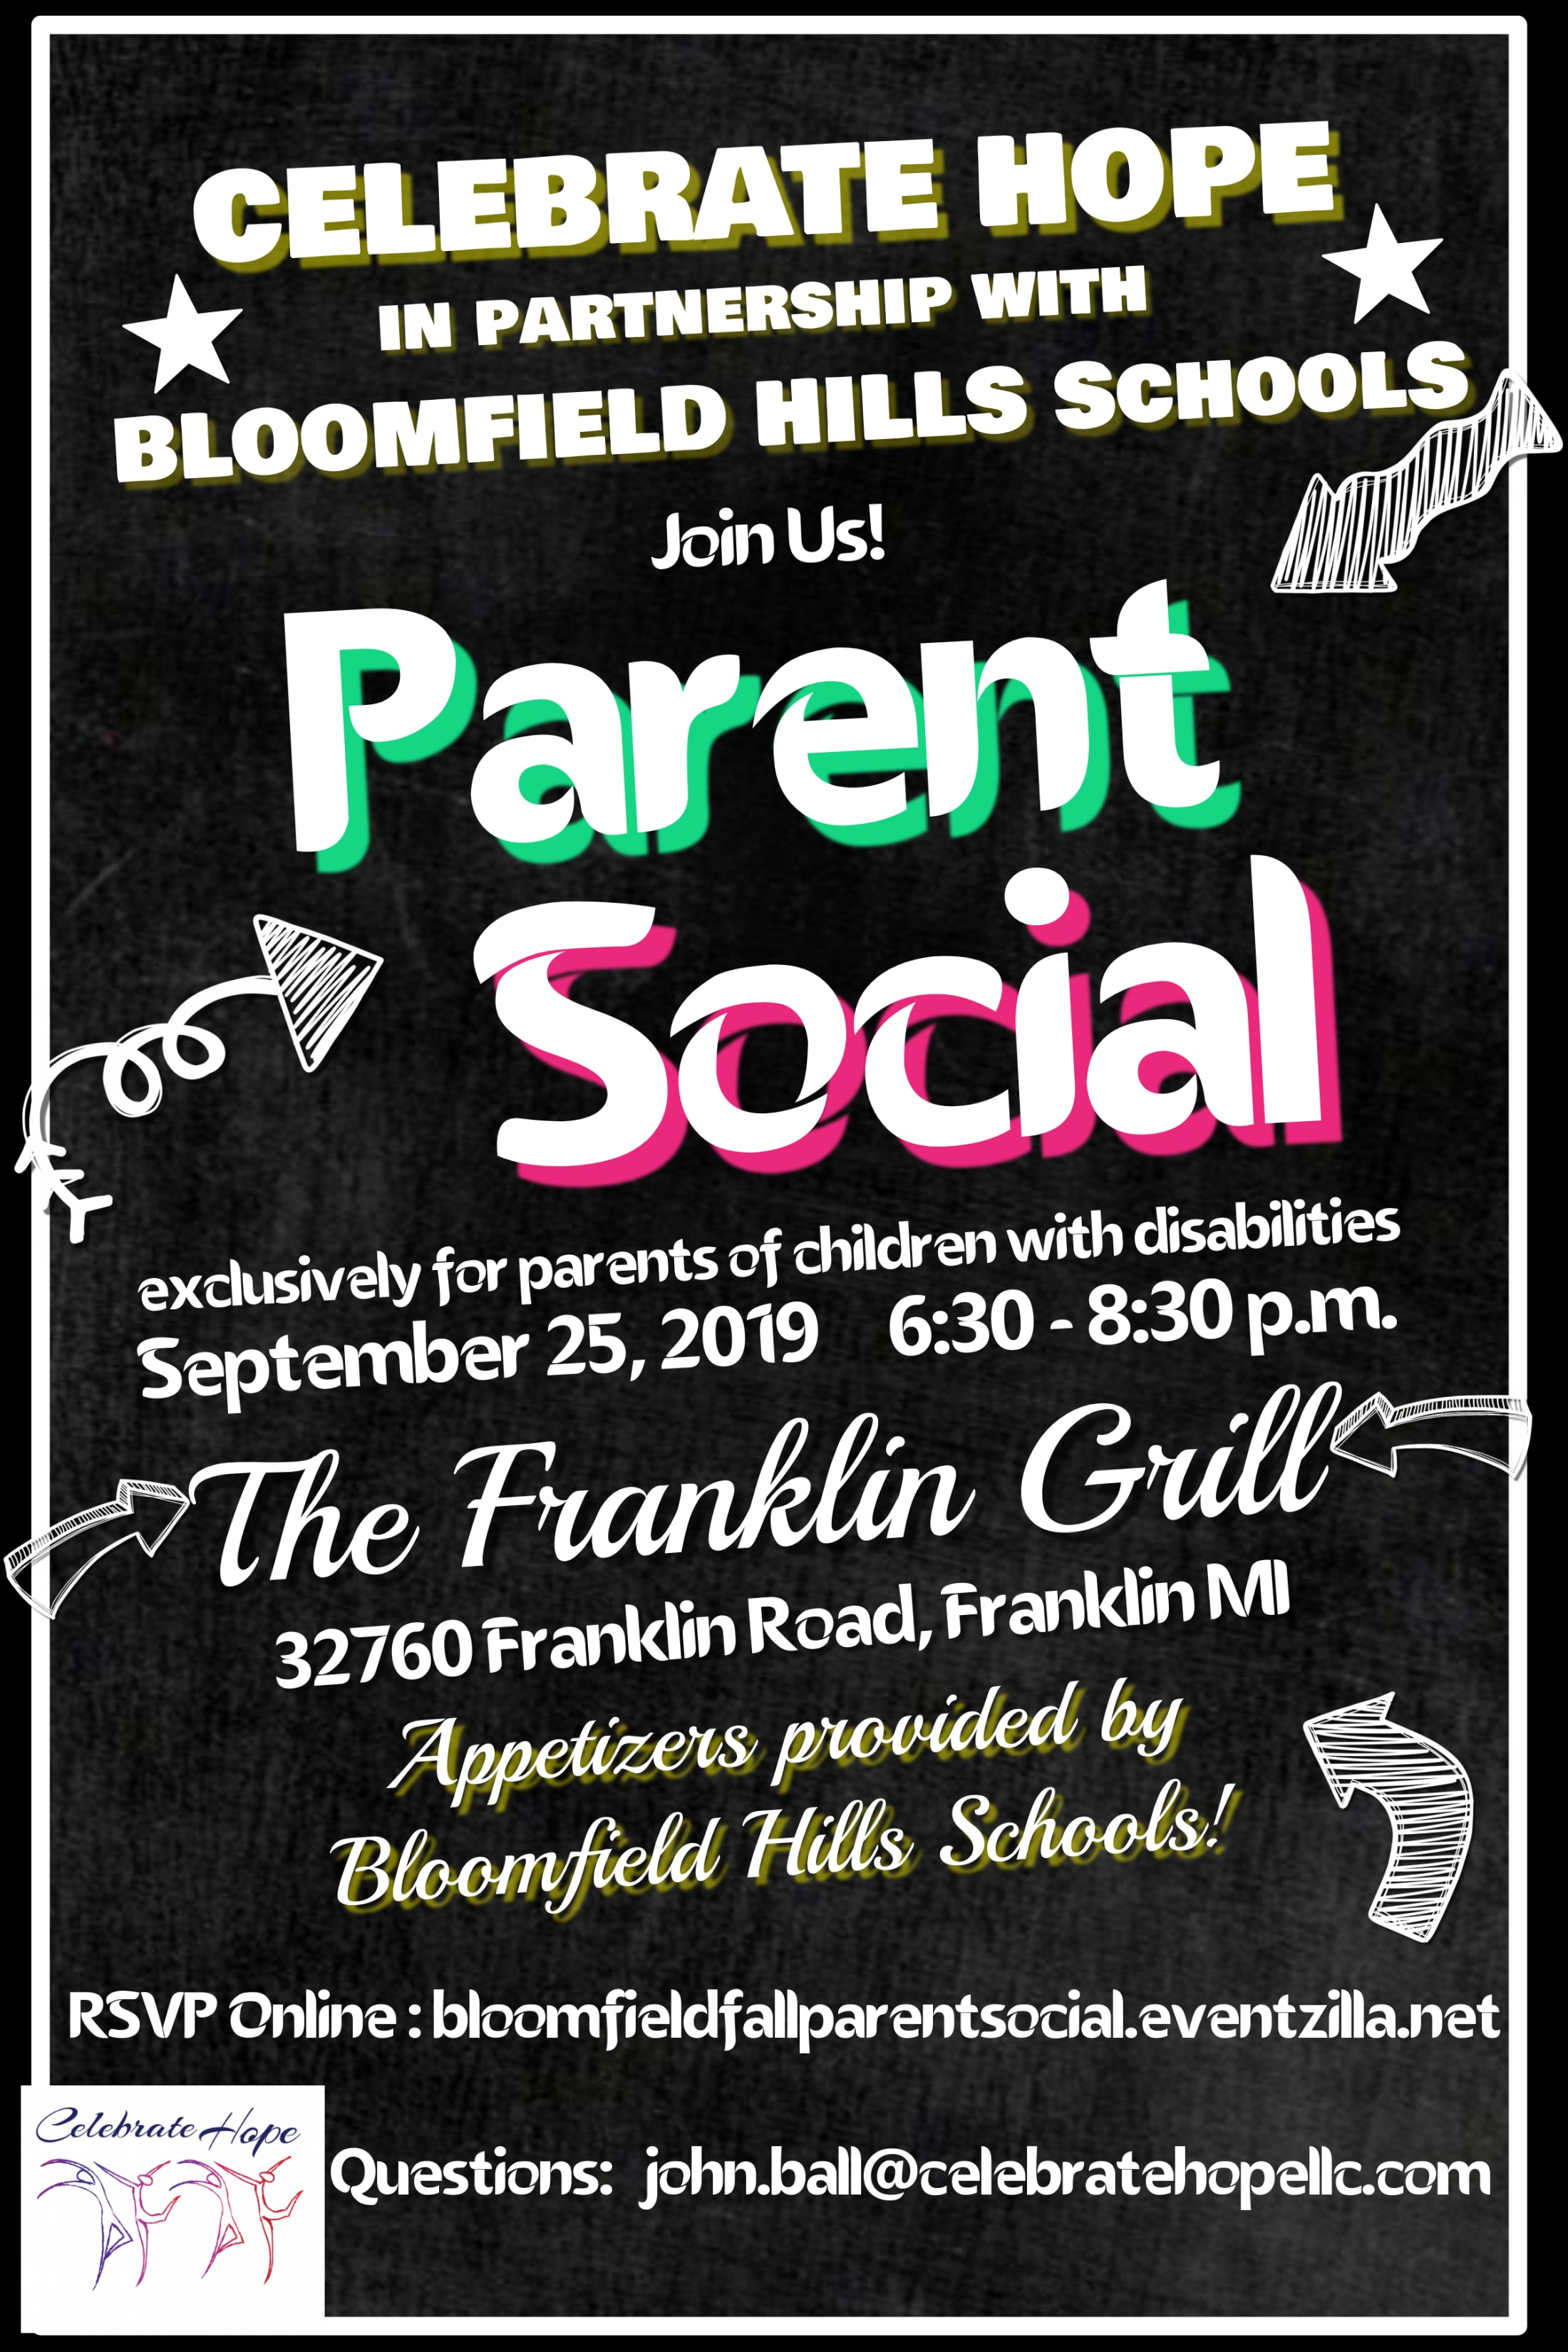 District News Details - Bloomfield Hills Schools